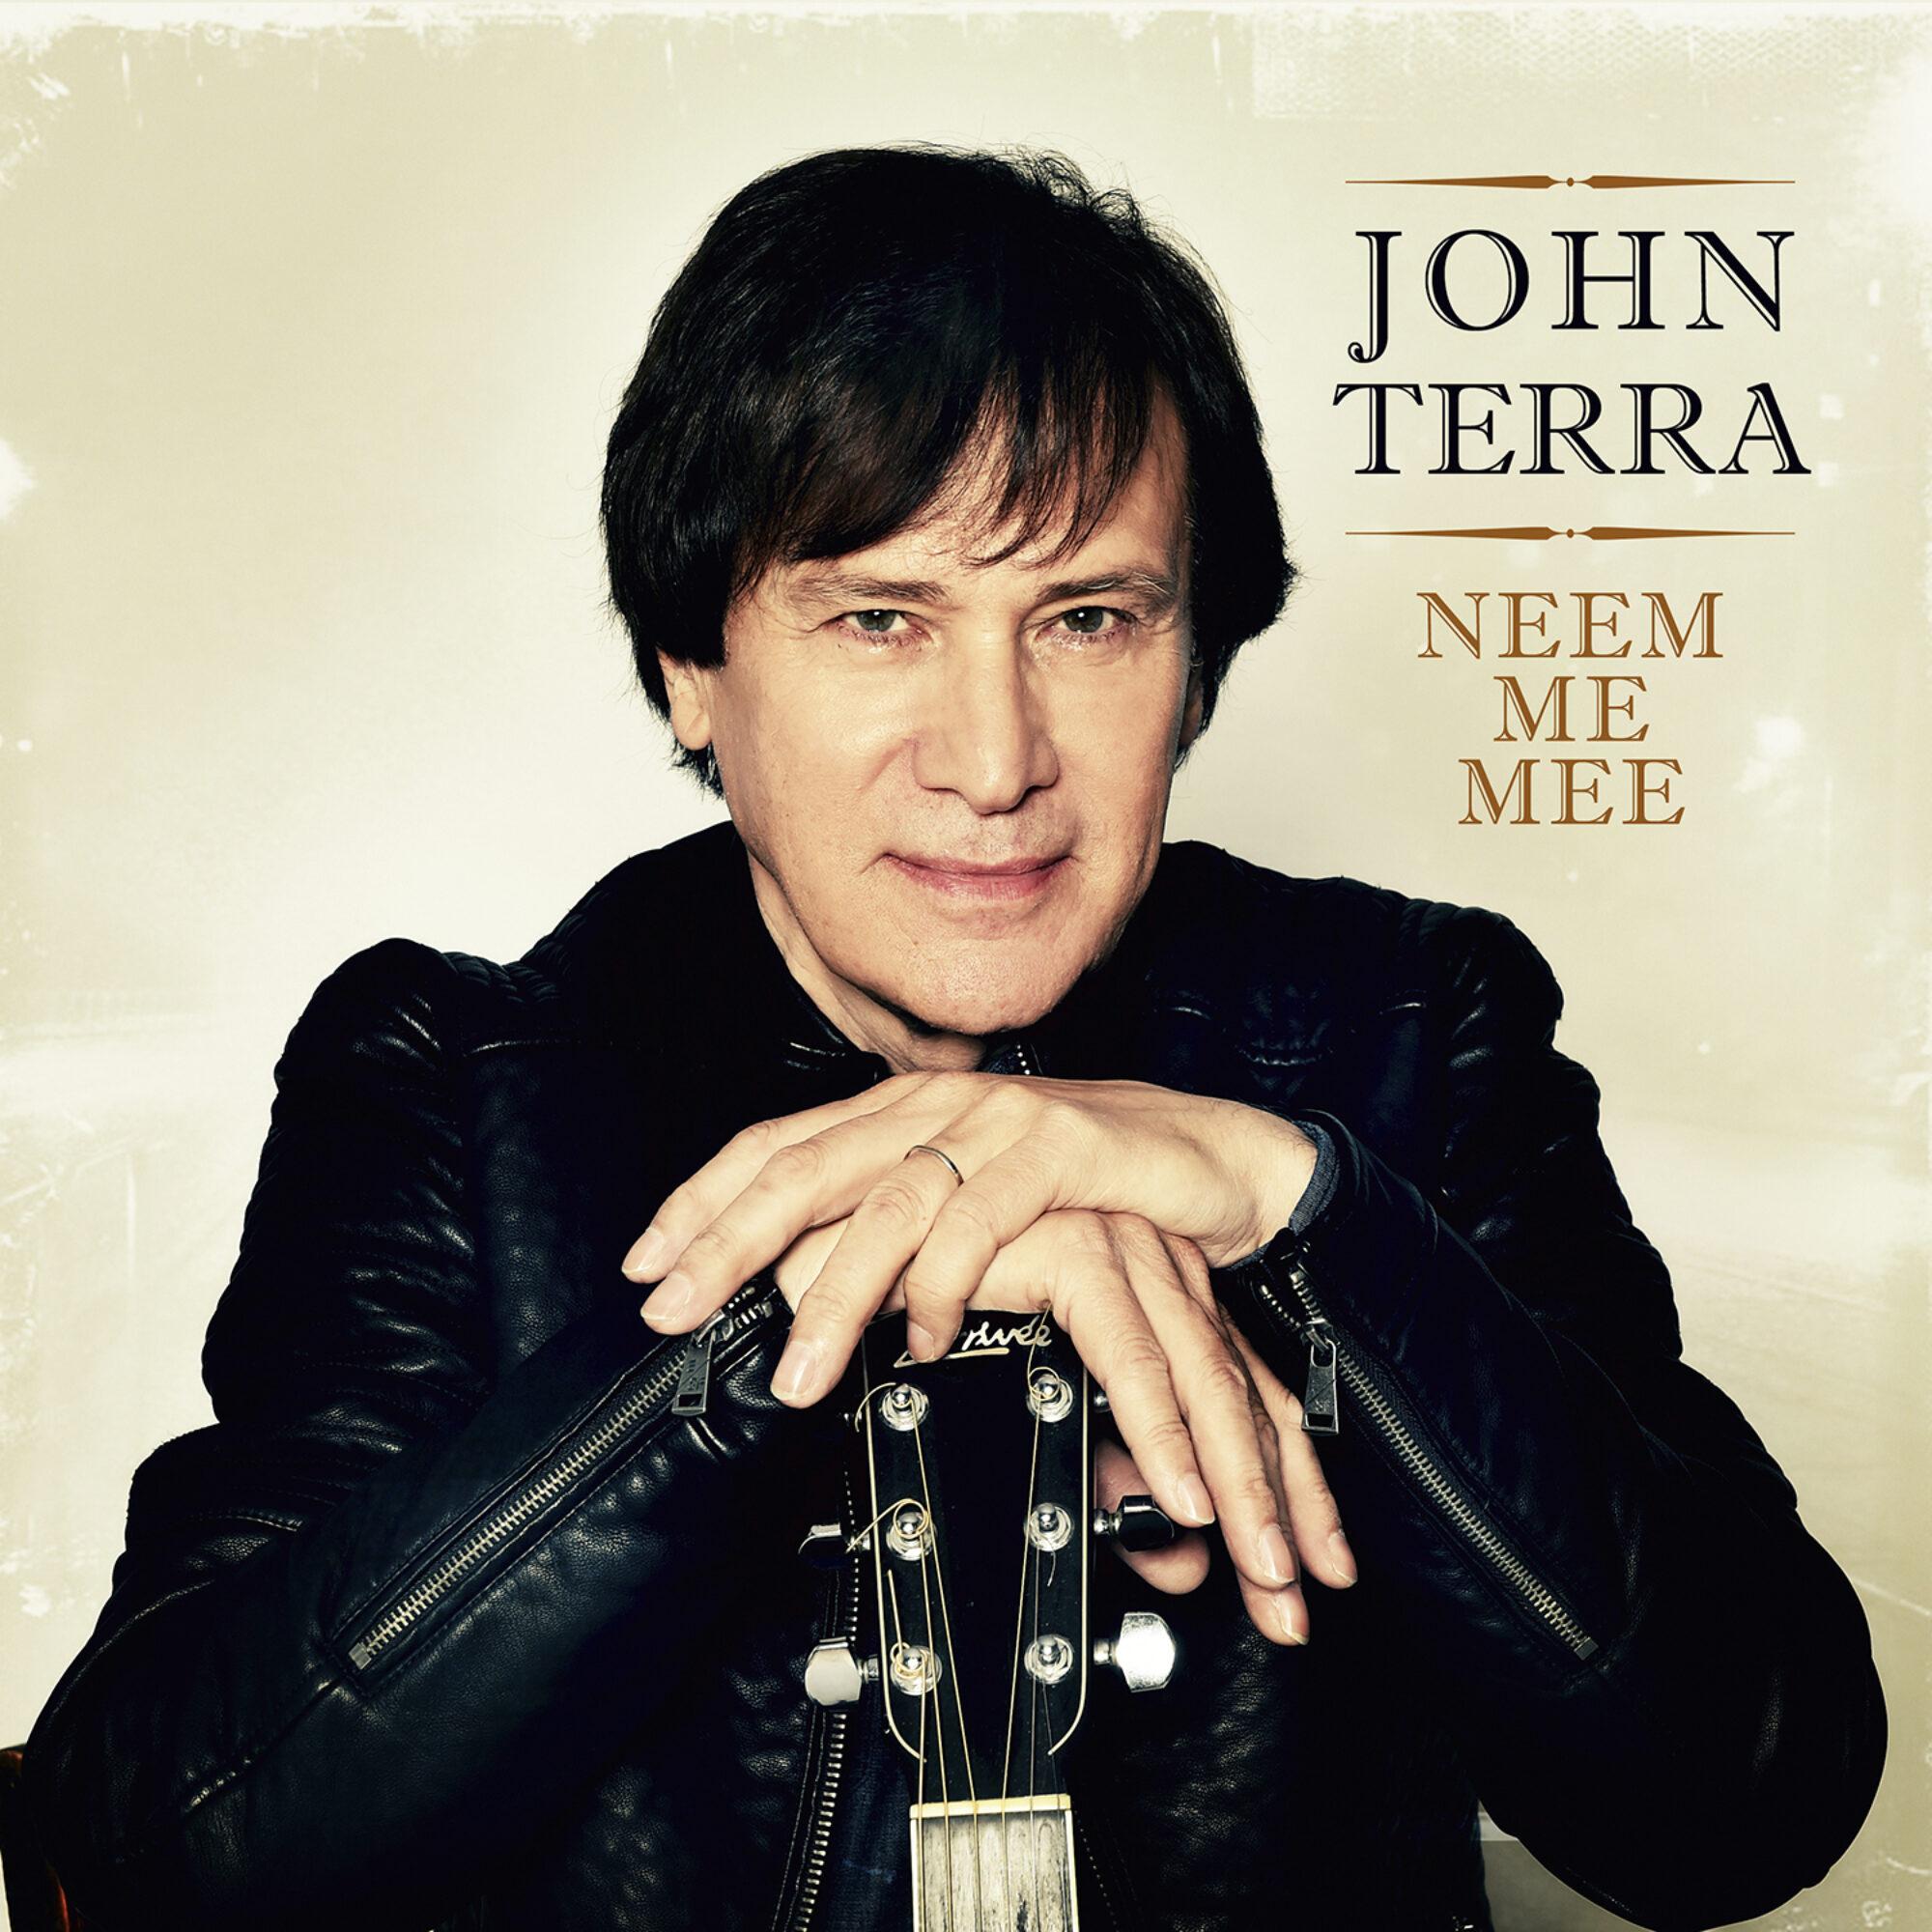 John Terra Neem Me Mee